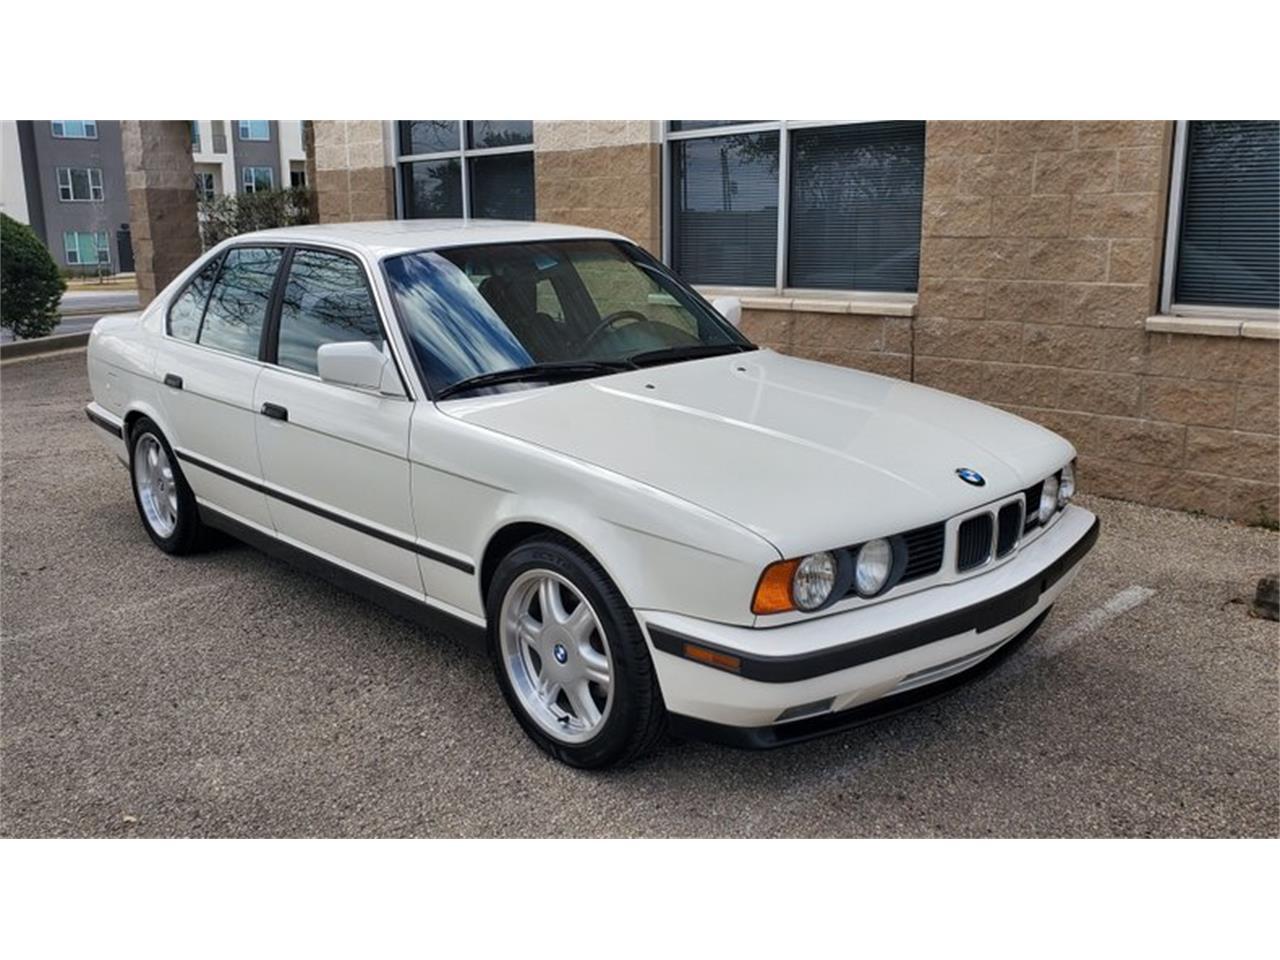 for sale 1991 bmw m5 in austin, texas cars - austin, tx at geebo